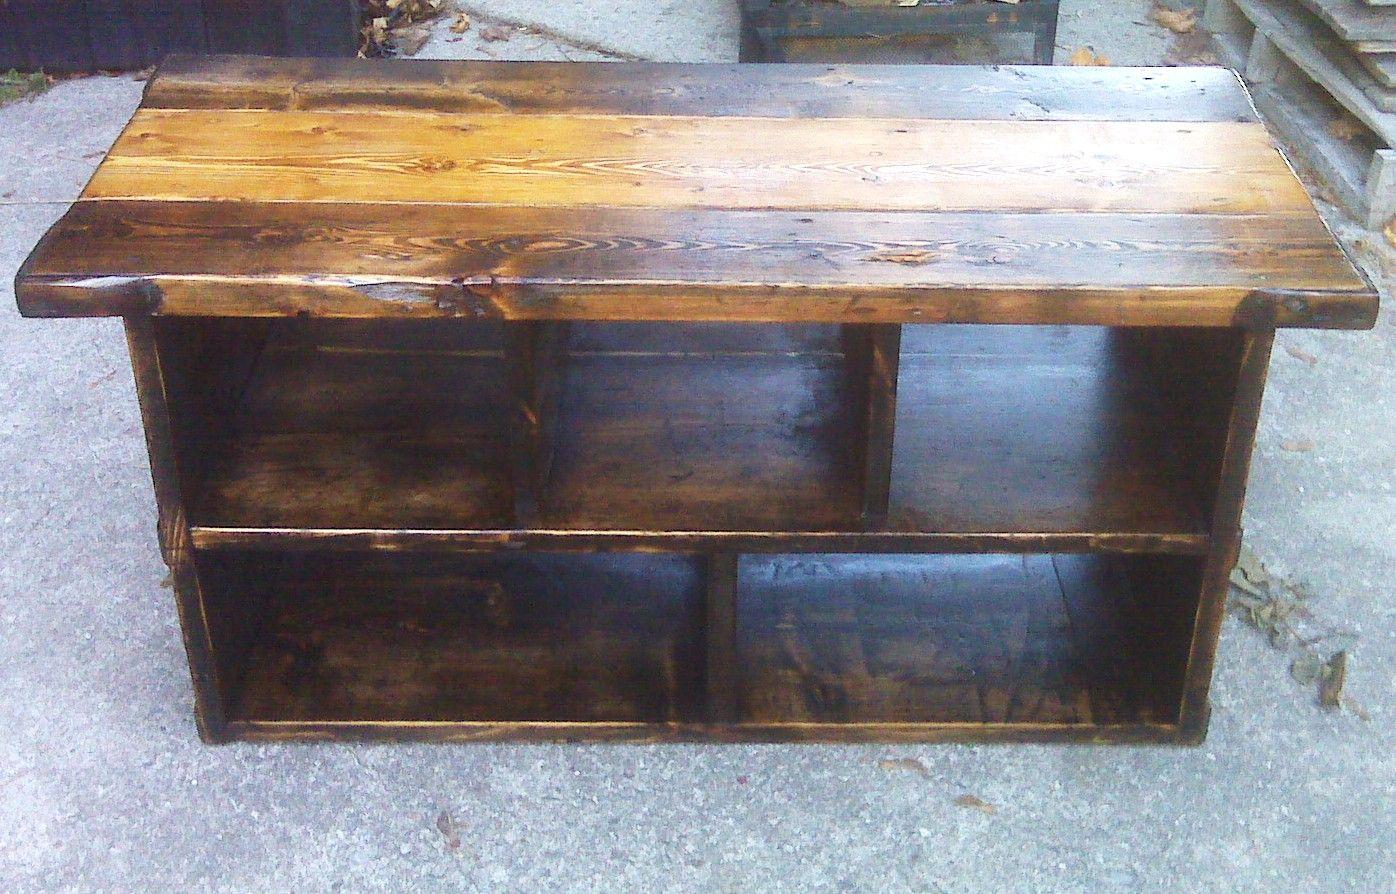 Rustic Barn Wood TV Console | Tv console diy, Diy tv stand ...